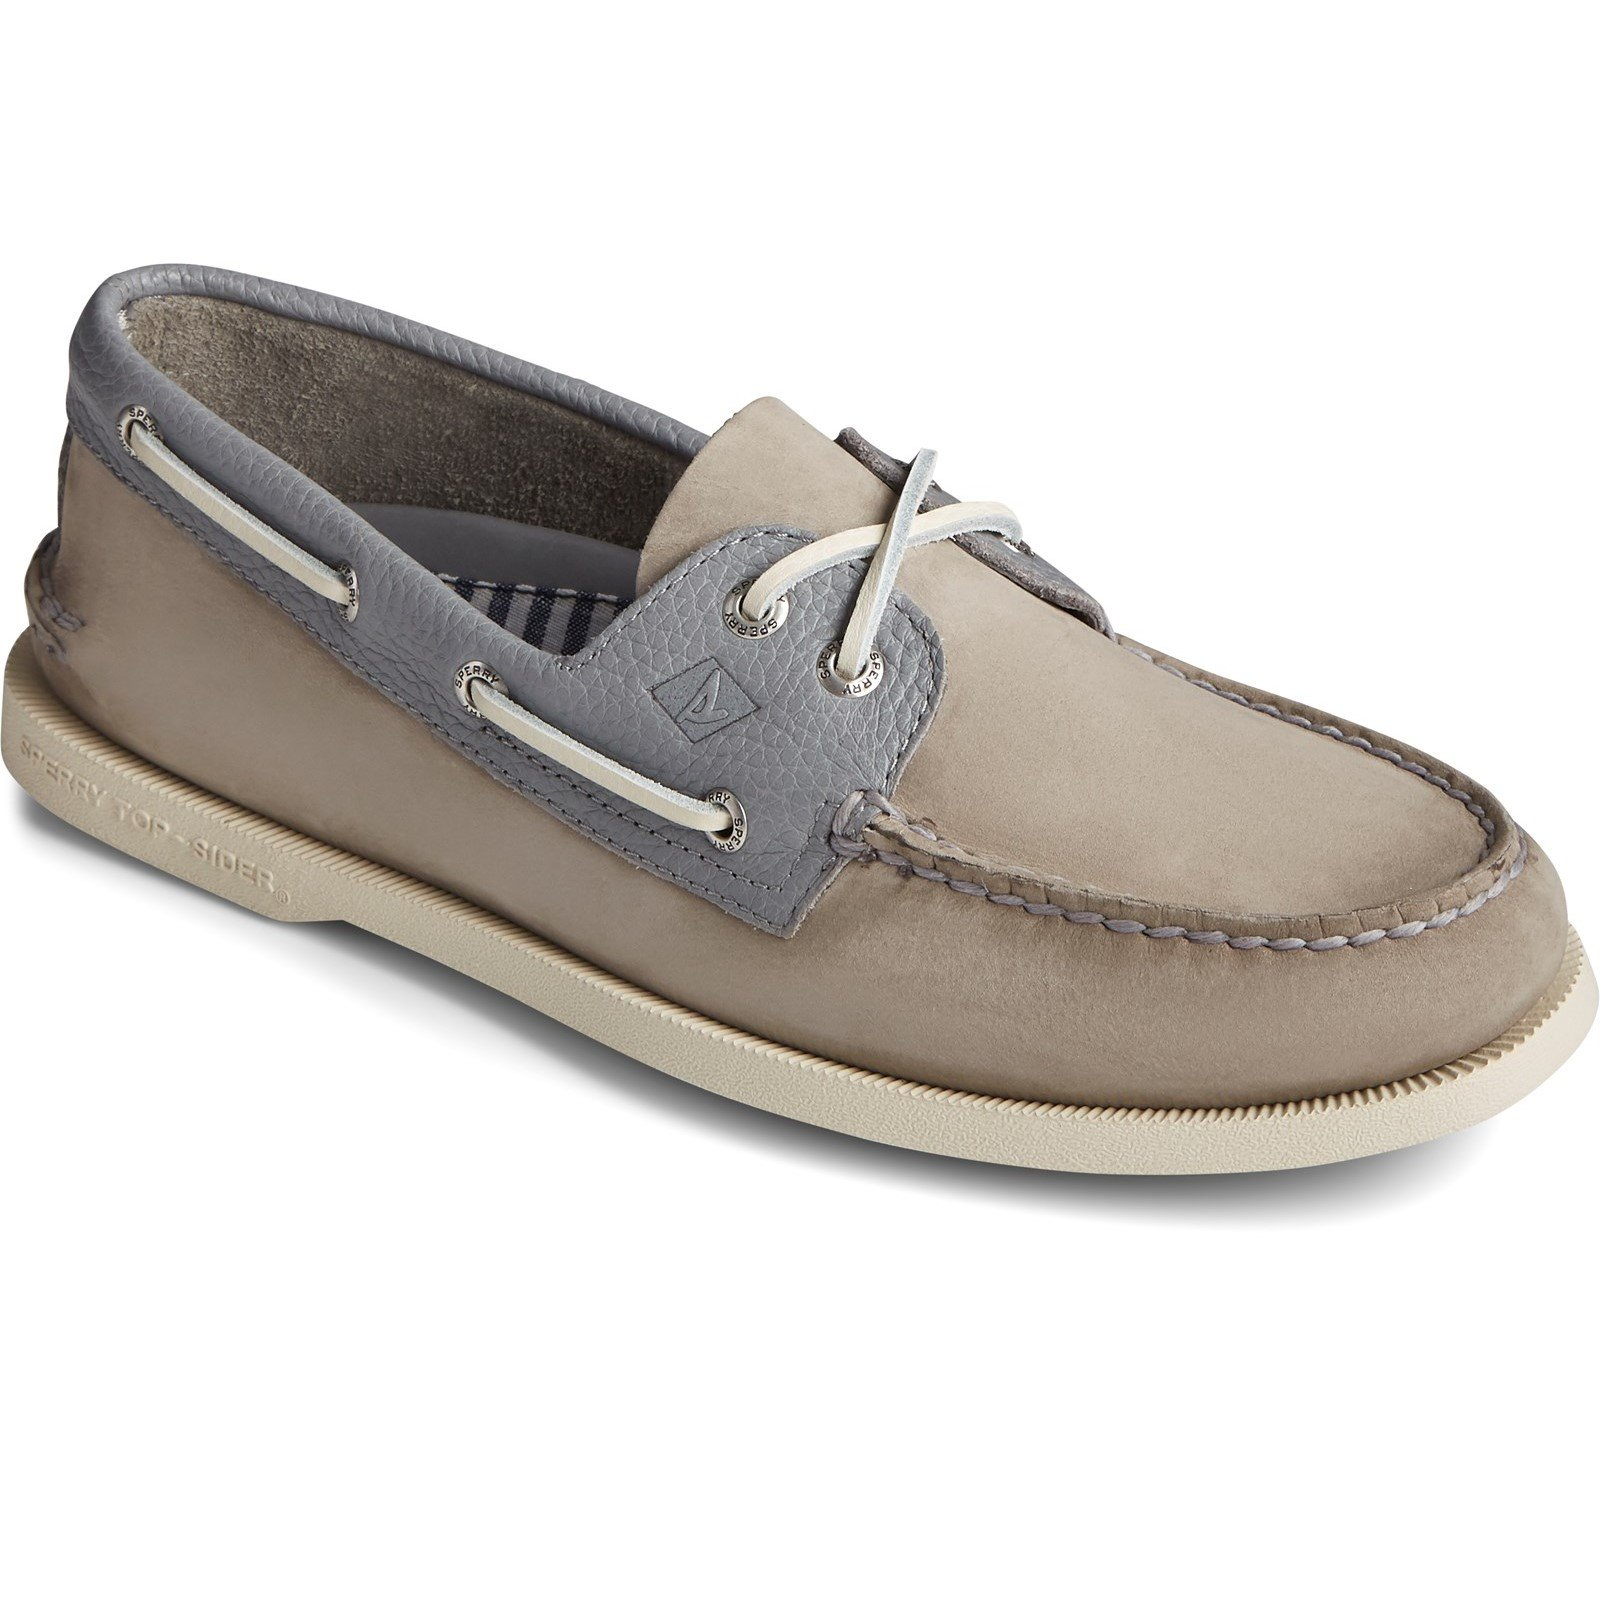 Sperry Men's A/O 2-Eye Nubuck Boat Shoe Various Colours 32920 - Grey 8